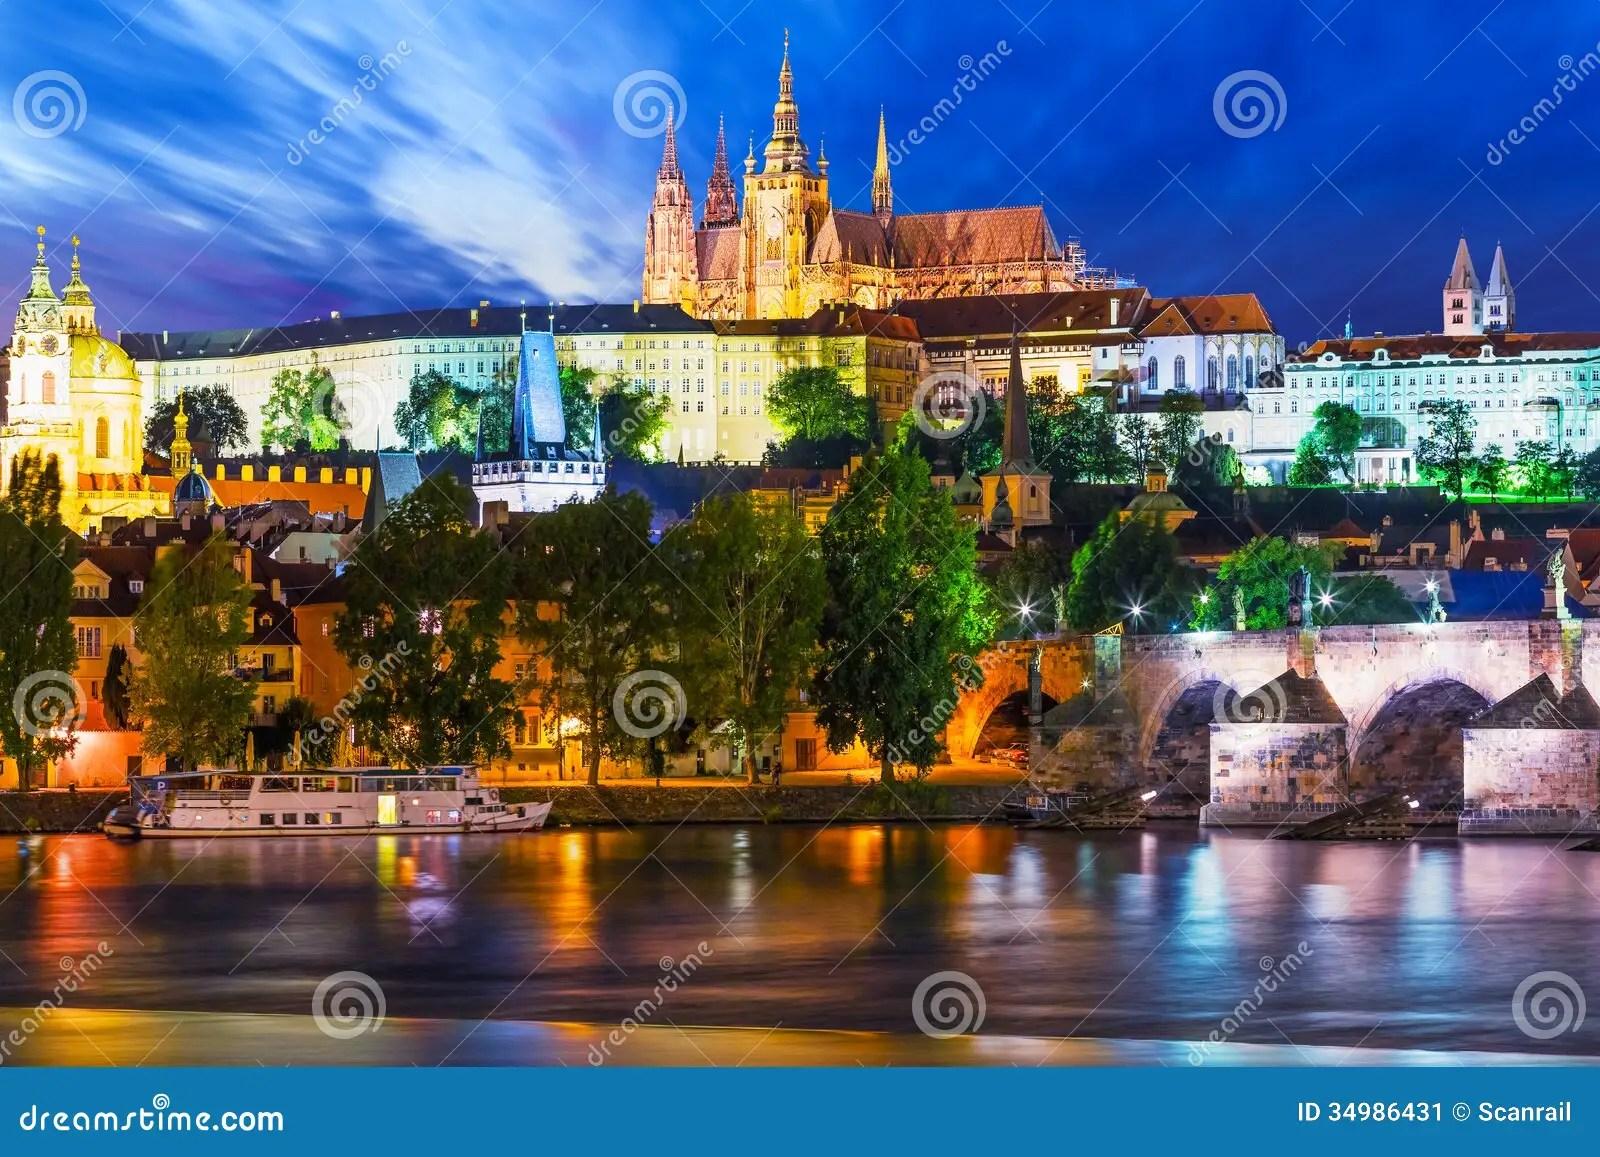 Night Scenery Of Prague Czech Republic Stock Image